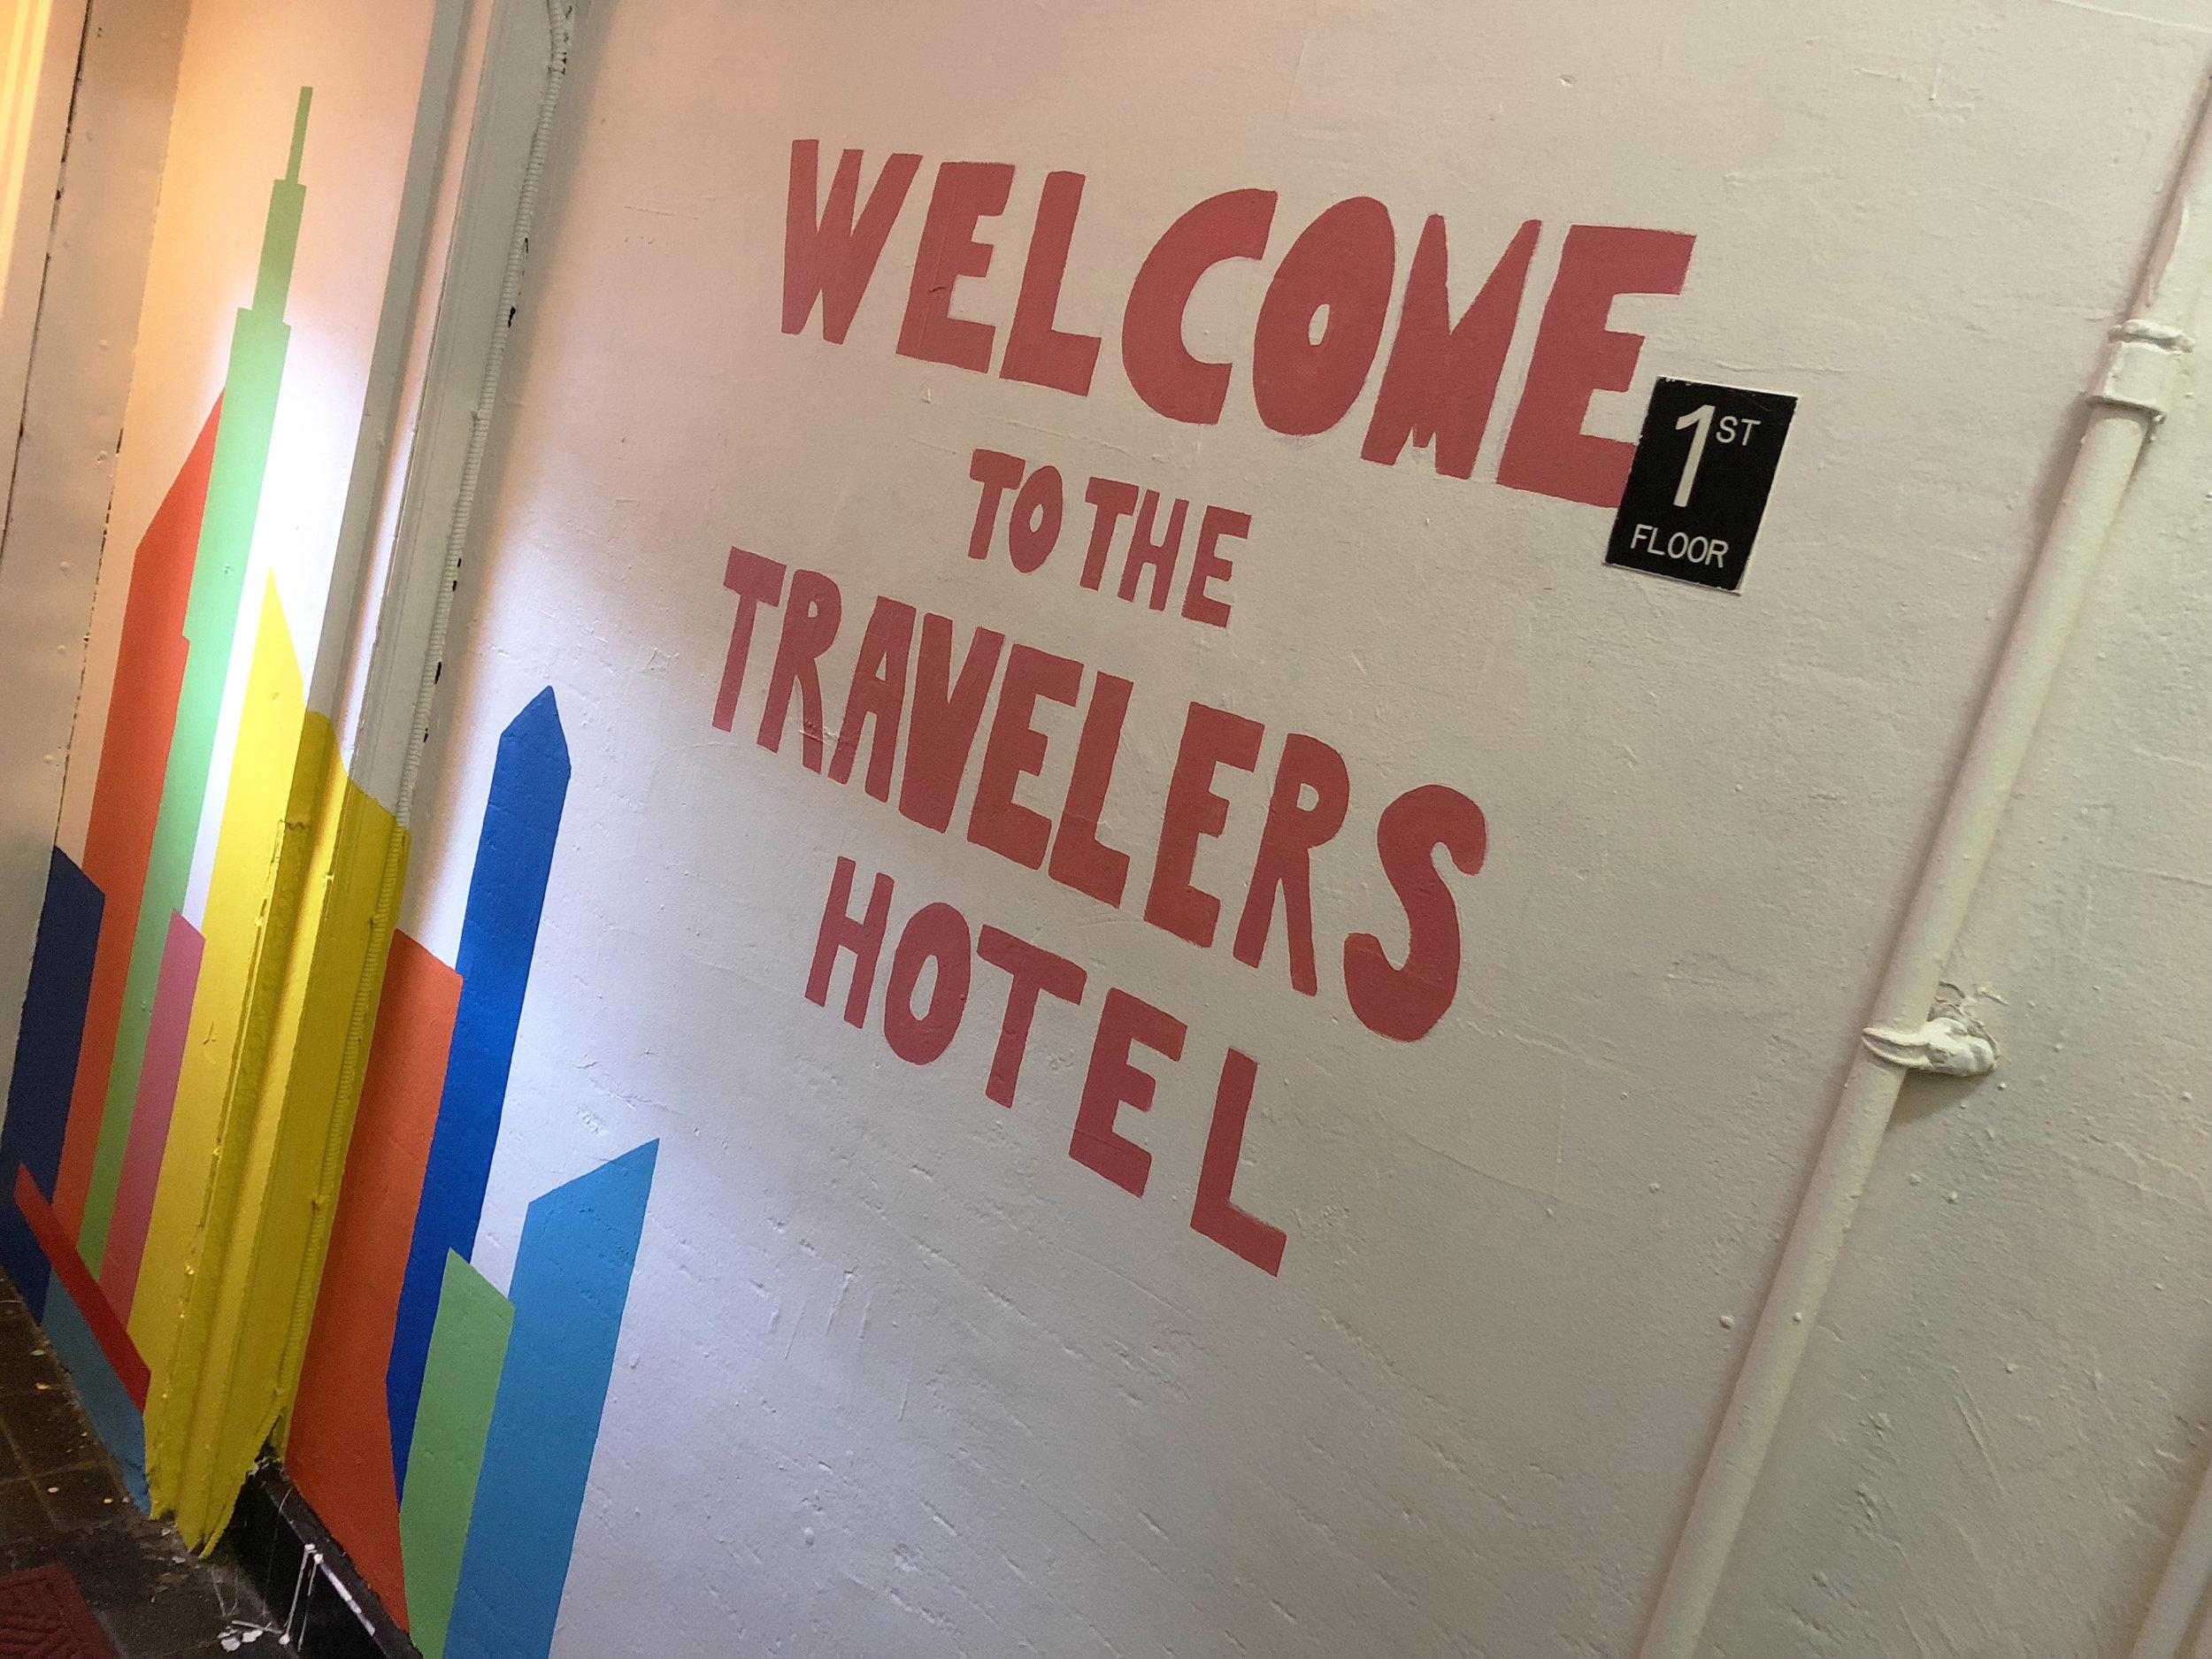 Updated lobby to Travelers thanks to the staff of Robert Graham.